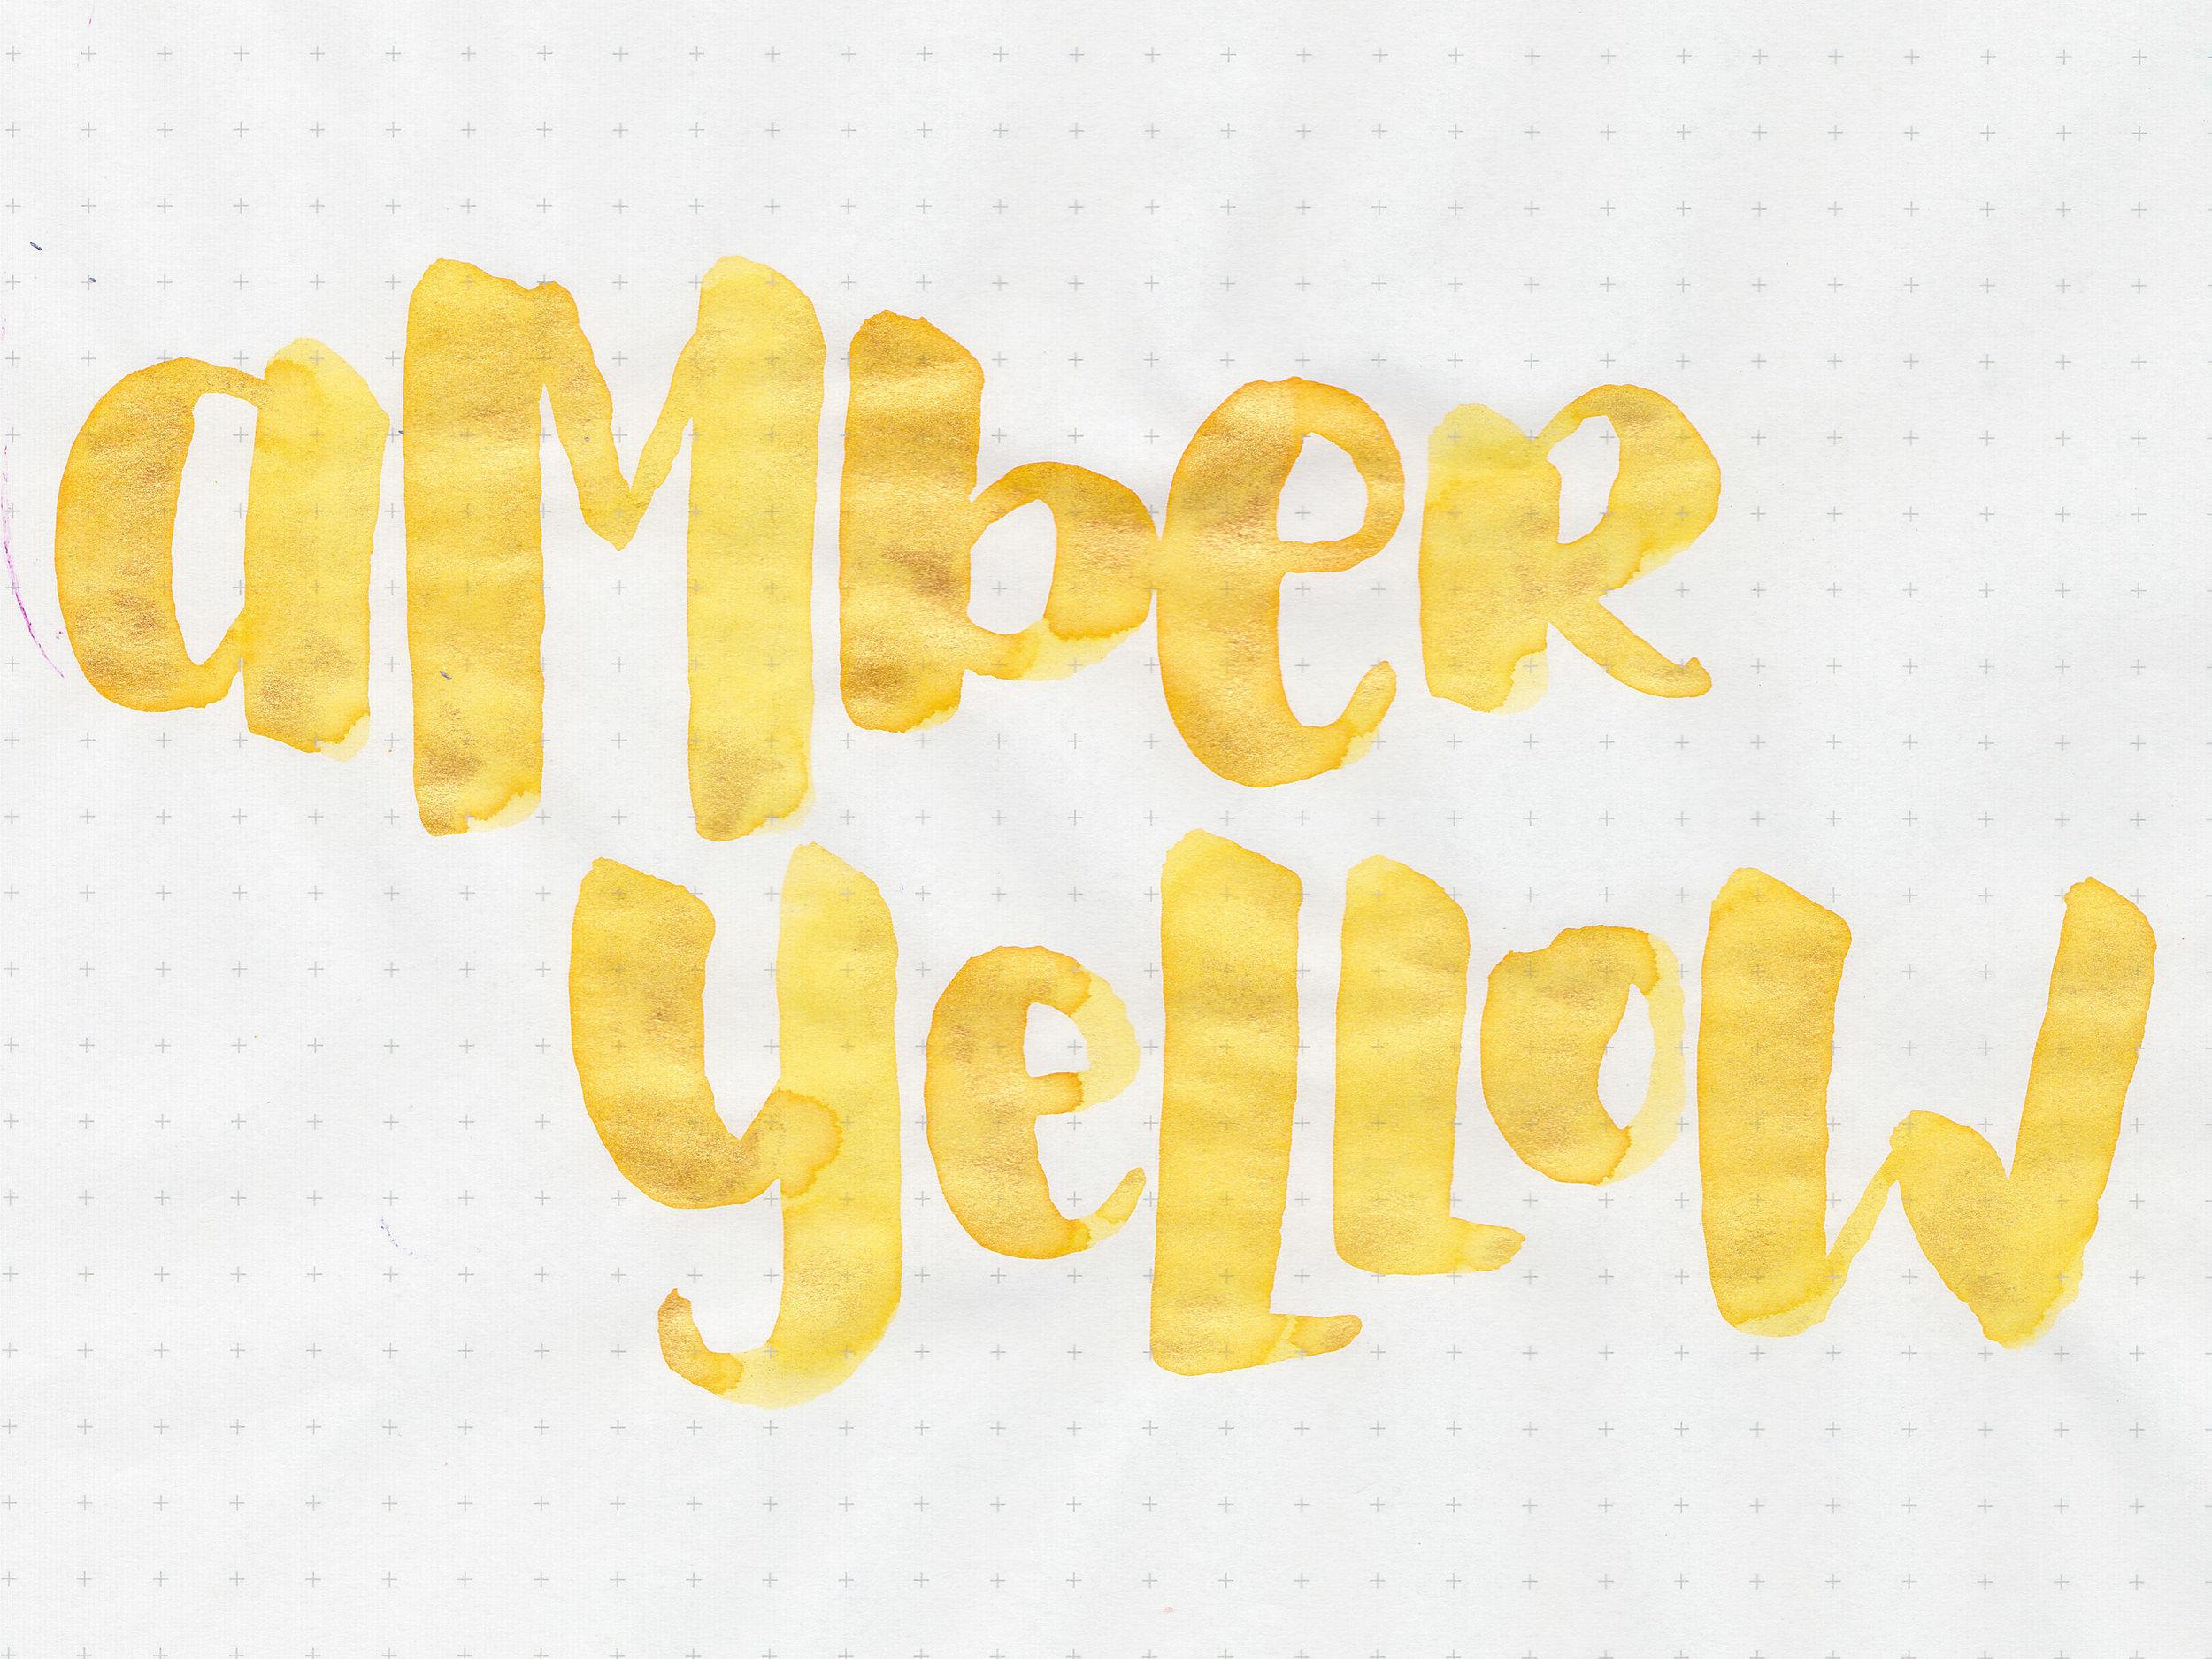 da-amber-yellow-5.jpg